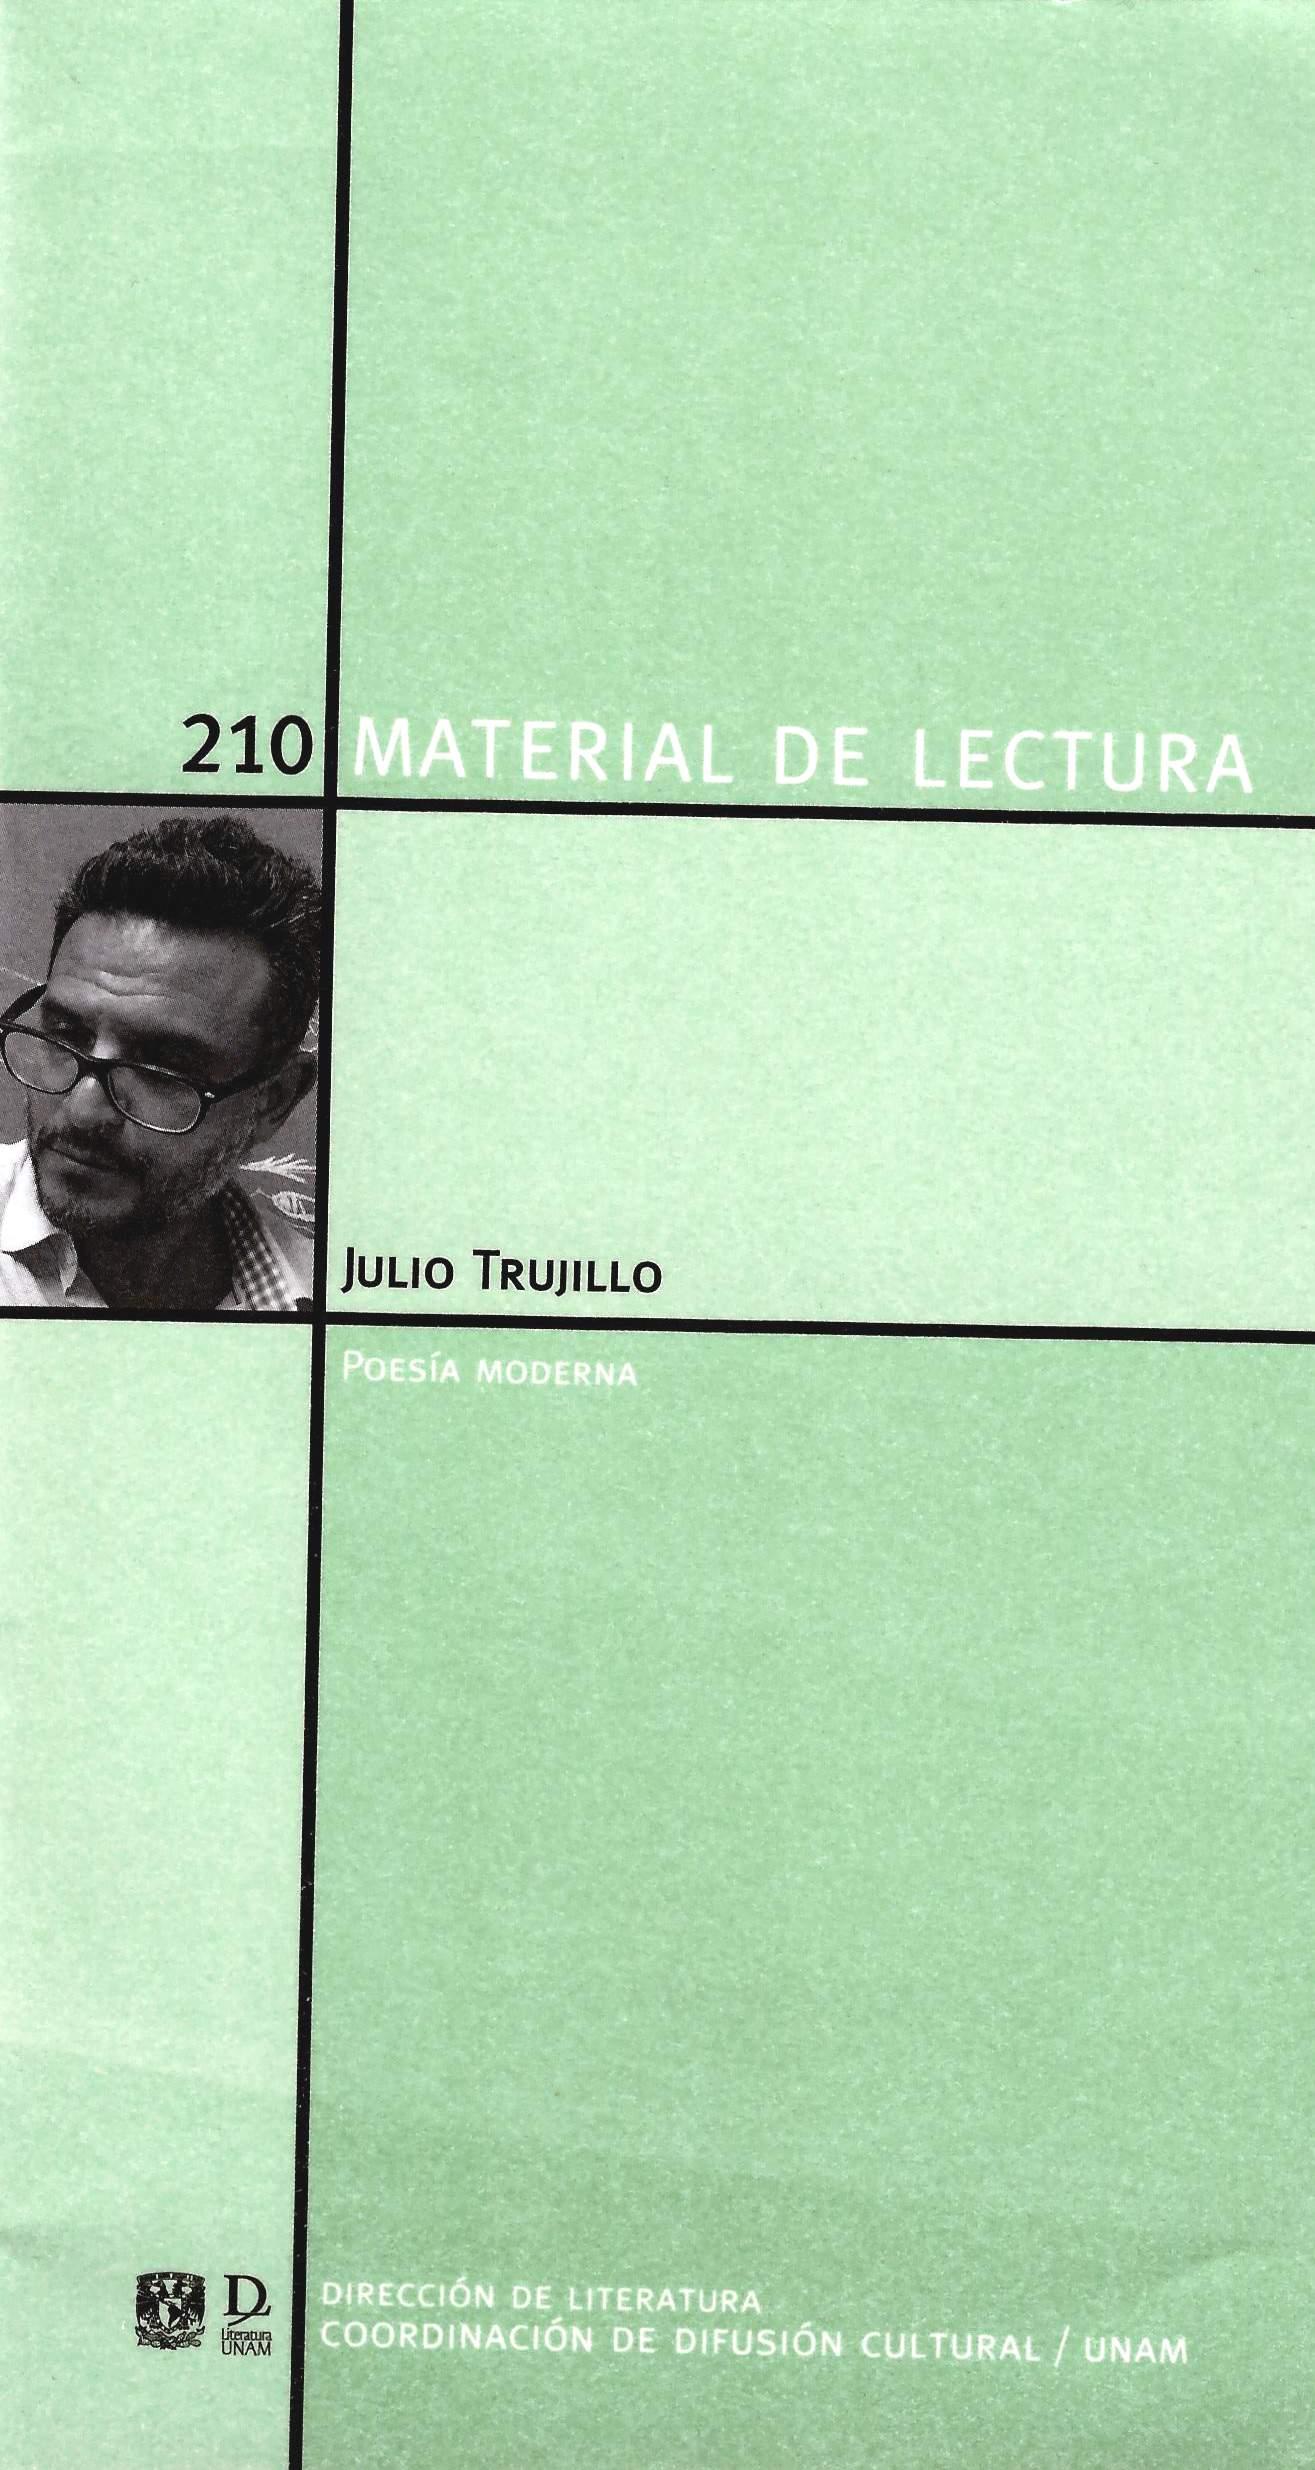 Julio Trujillo. Poesía moderna 210